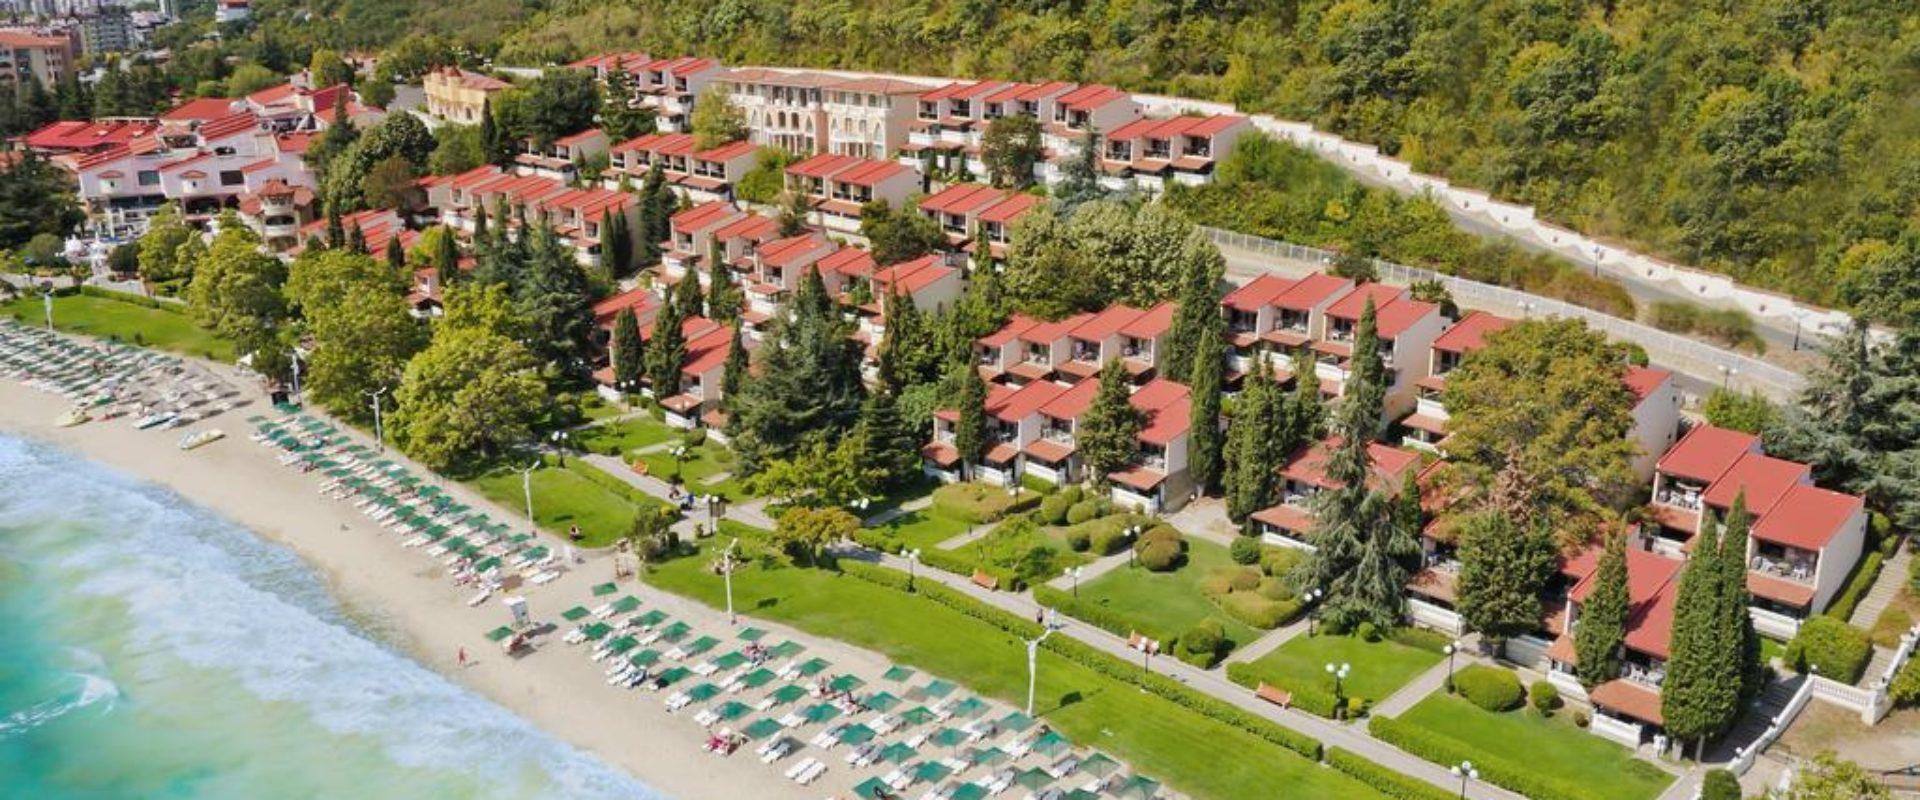 Odihnă în Bulgaria 2020, Elenite, Hotel Villas Elenite